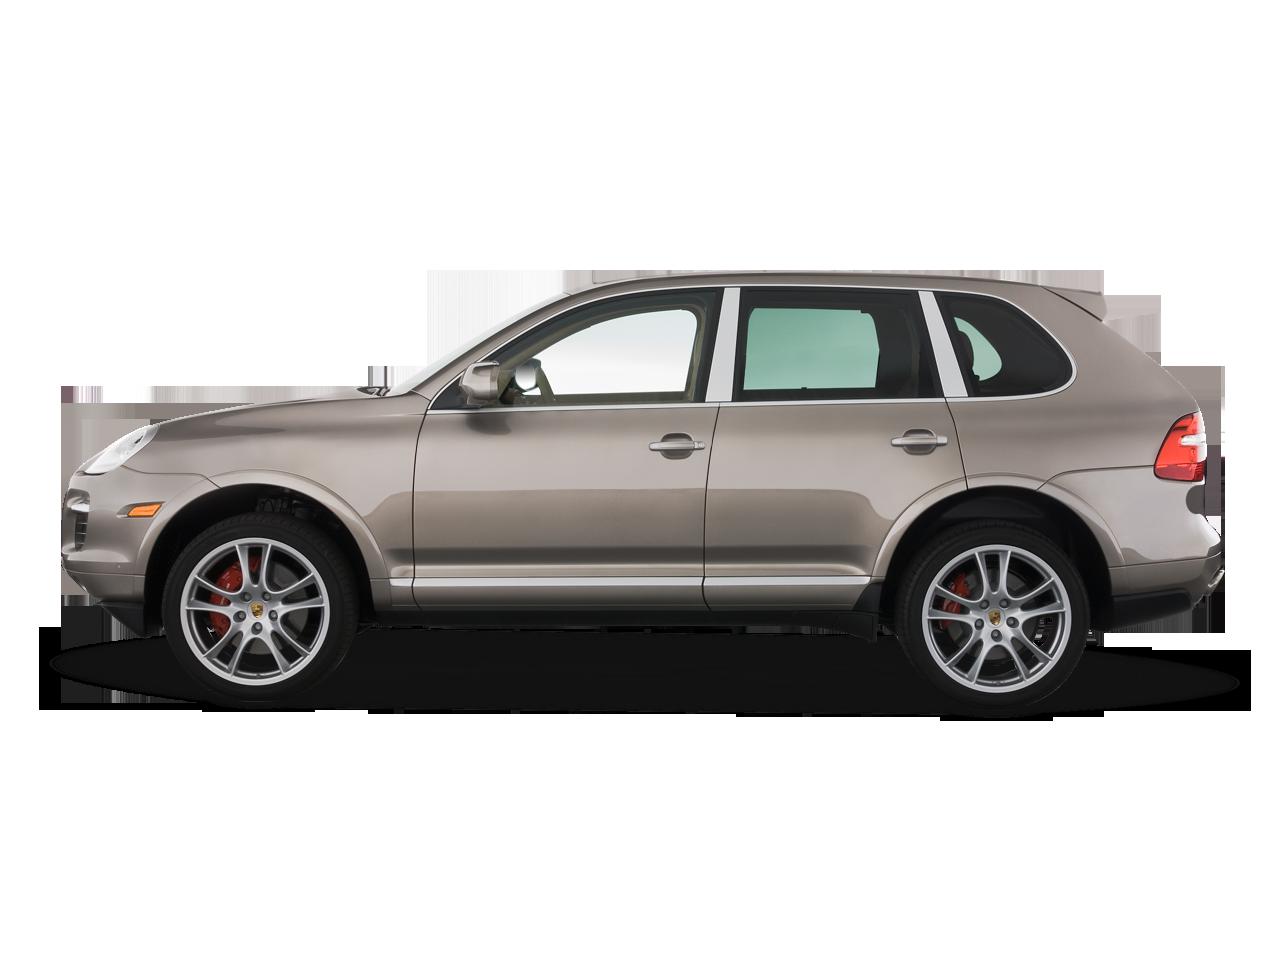 2009 porsche cayenne turbo s porsche luxury crossover suv review automobile magazine. Black Bedroom Furniture Sets. Home Design Ideas